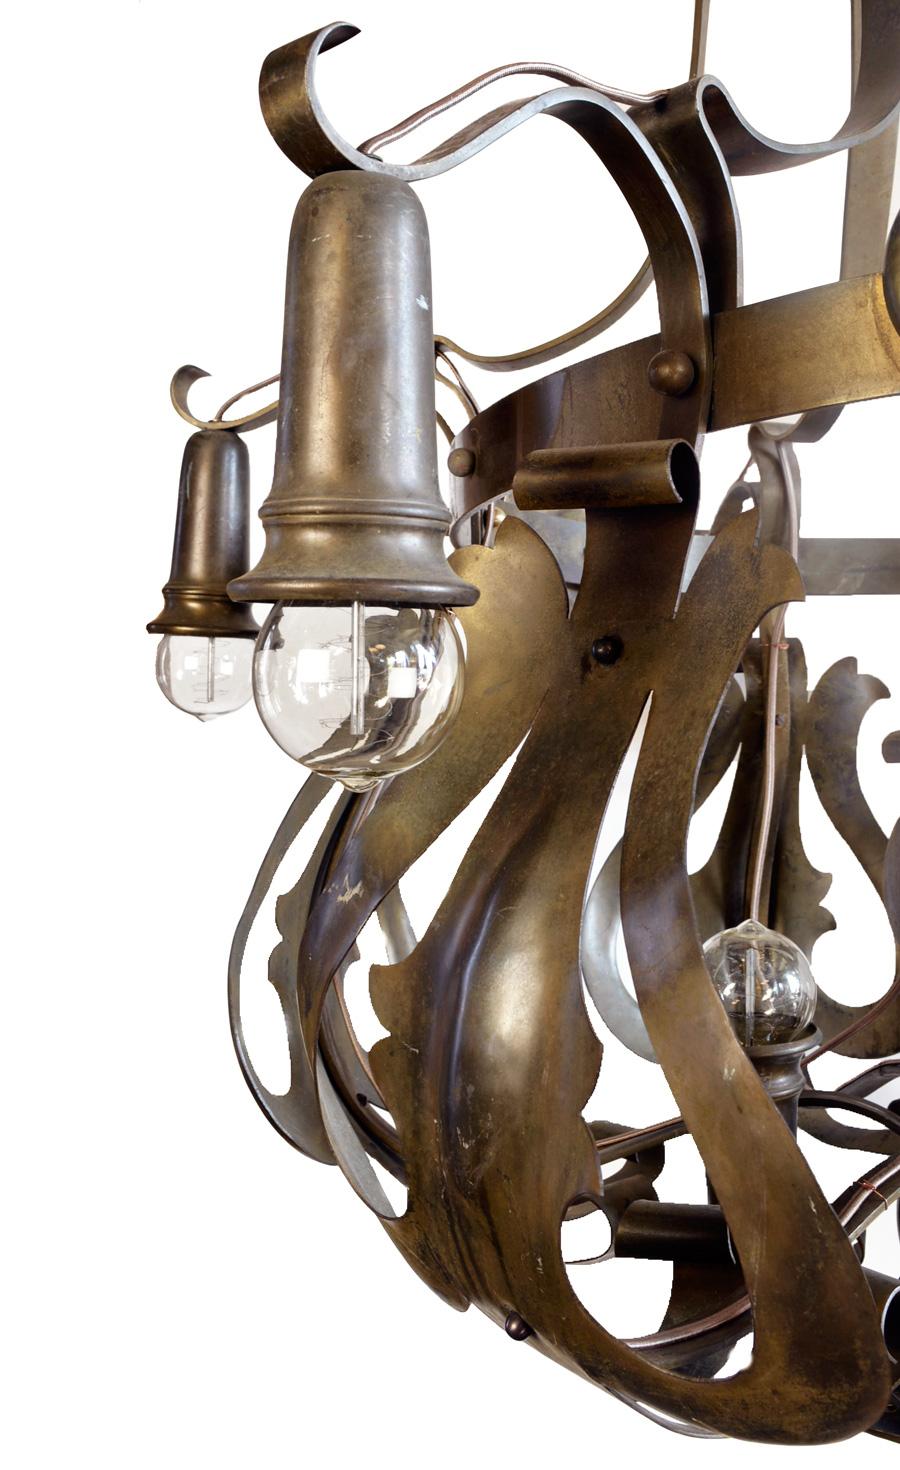 43288-art-nouveau-chandelier-detail.jpg